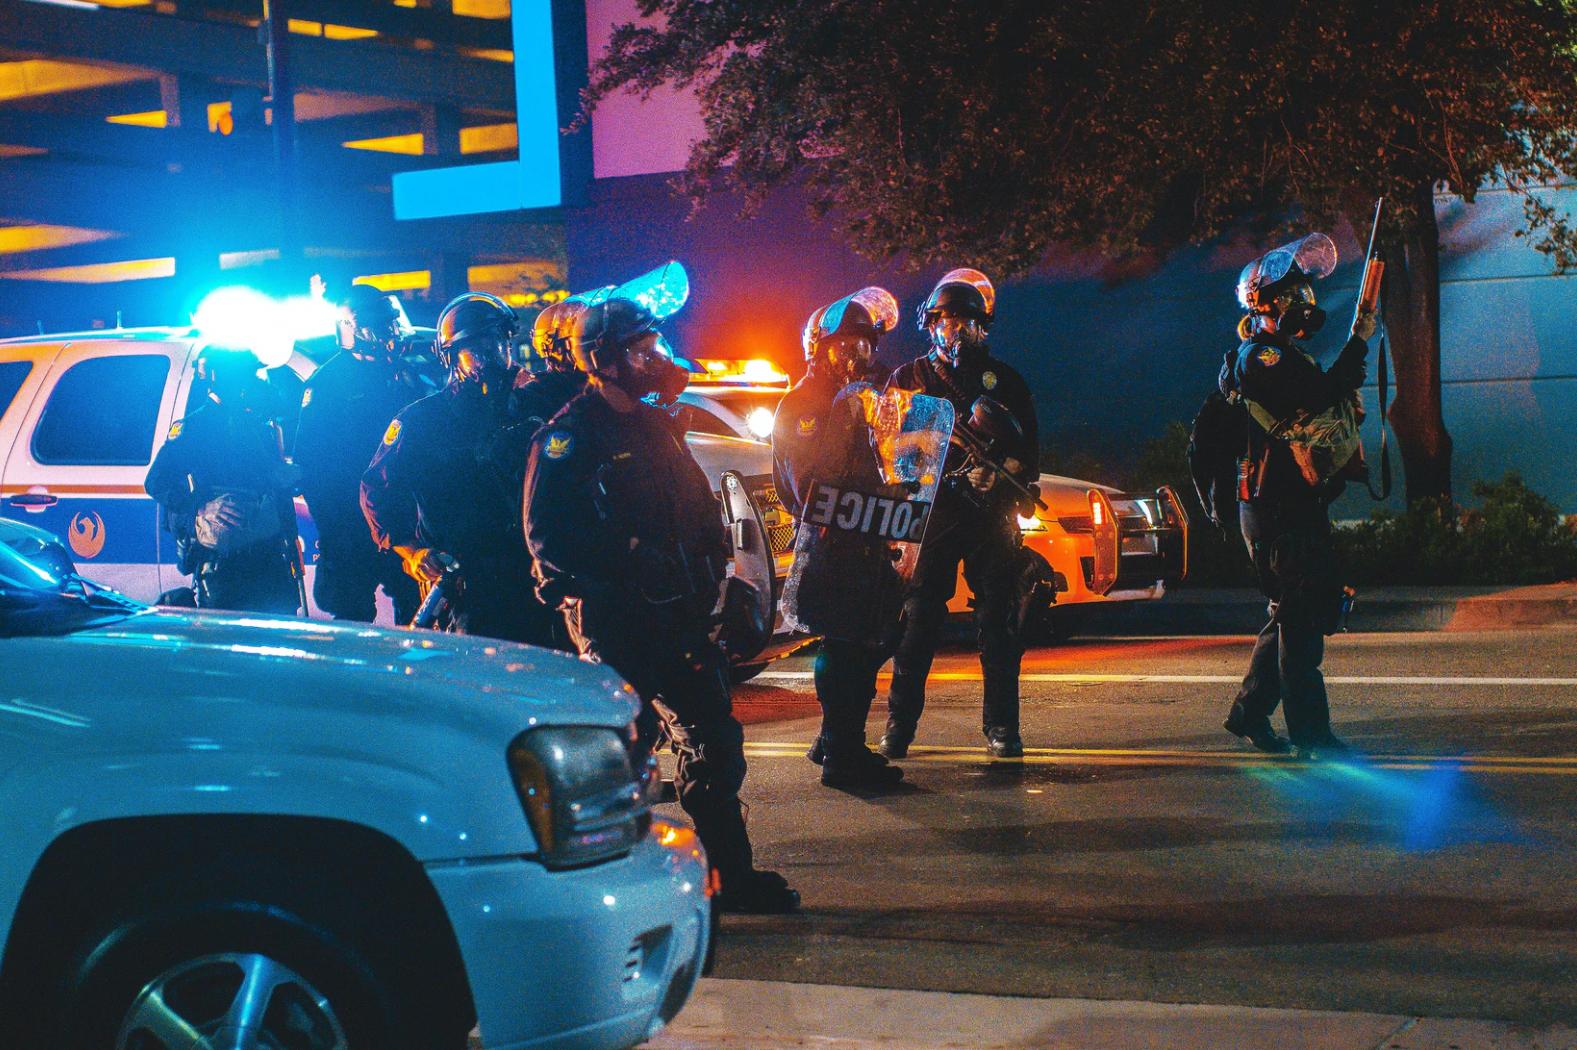 (Source: unsplash.com/@ajcolores) Police wearing body armor prepare to confront protesters